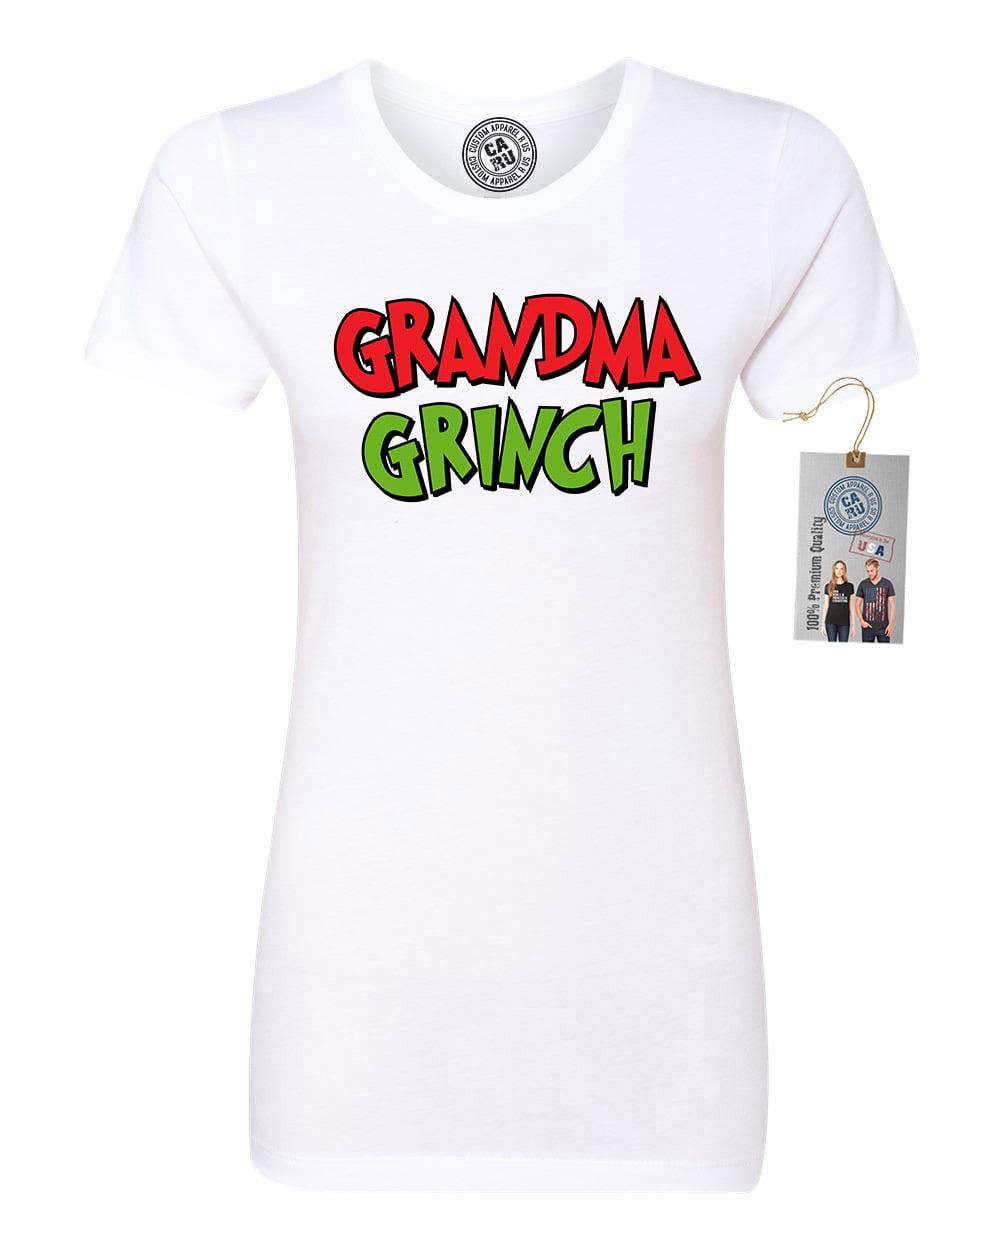 Custom Apparel R Us - Grandma The Grinch Womens Short ...